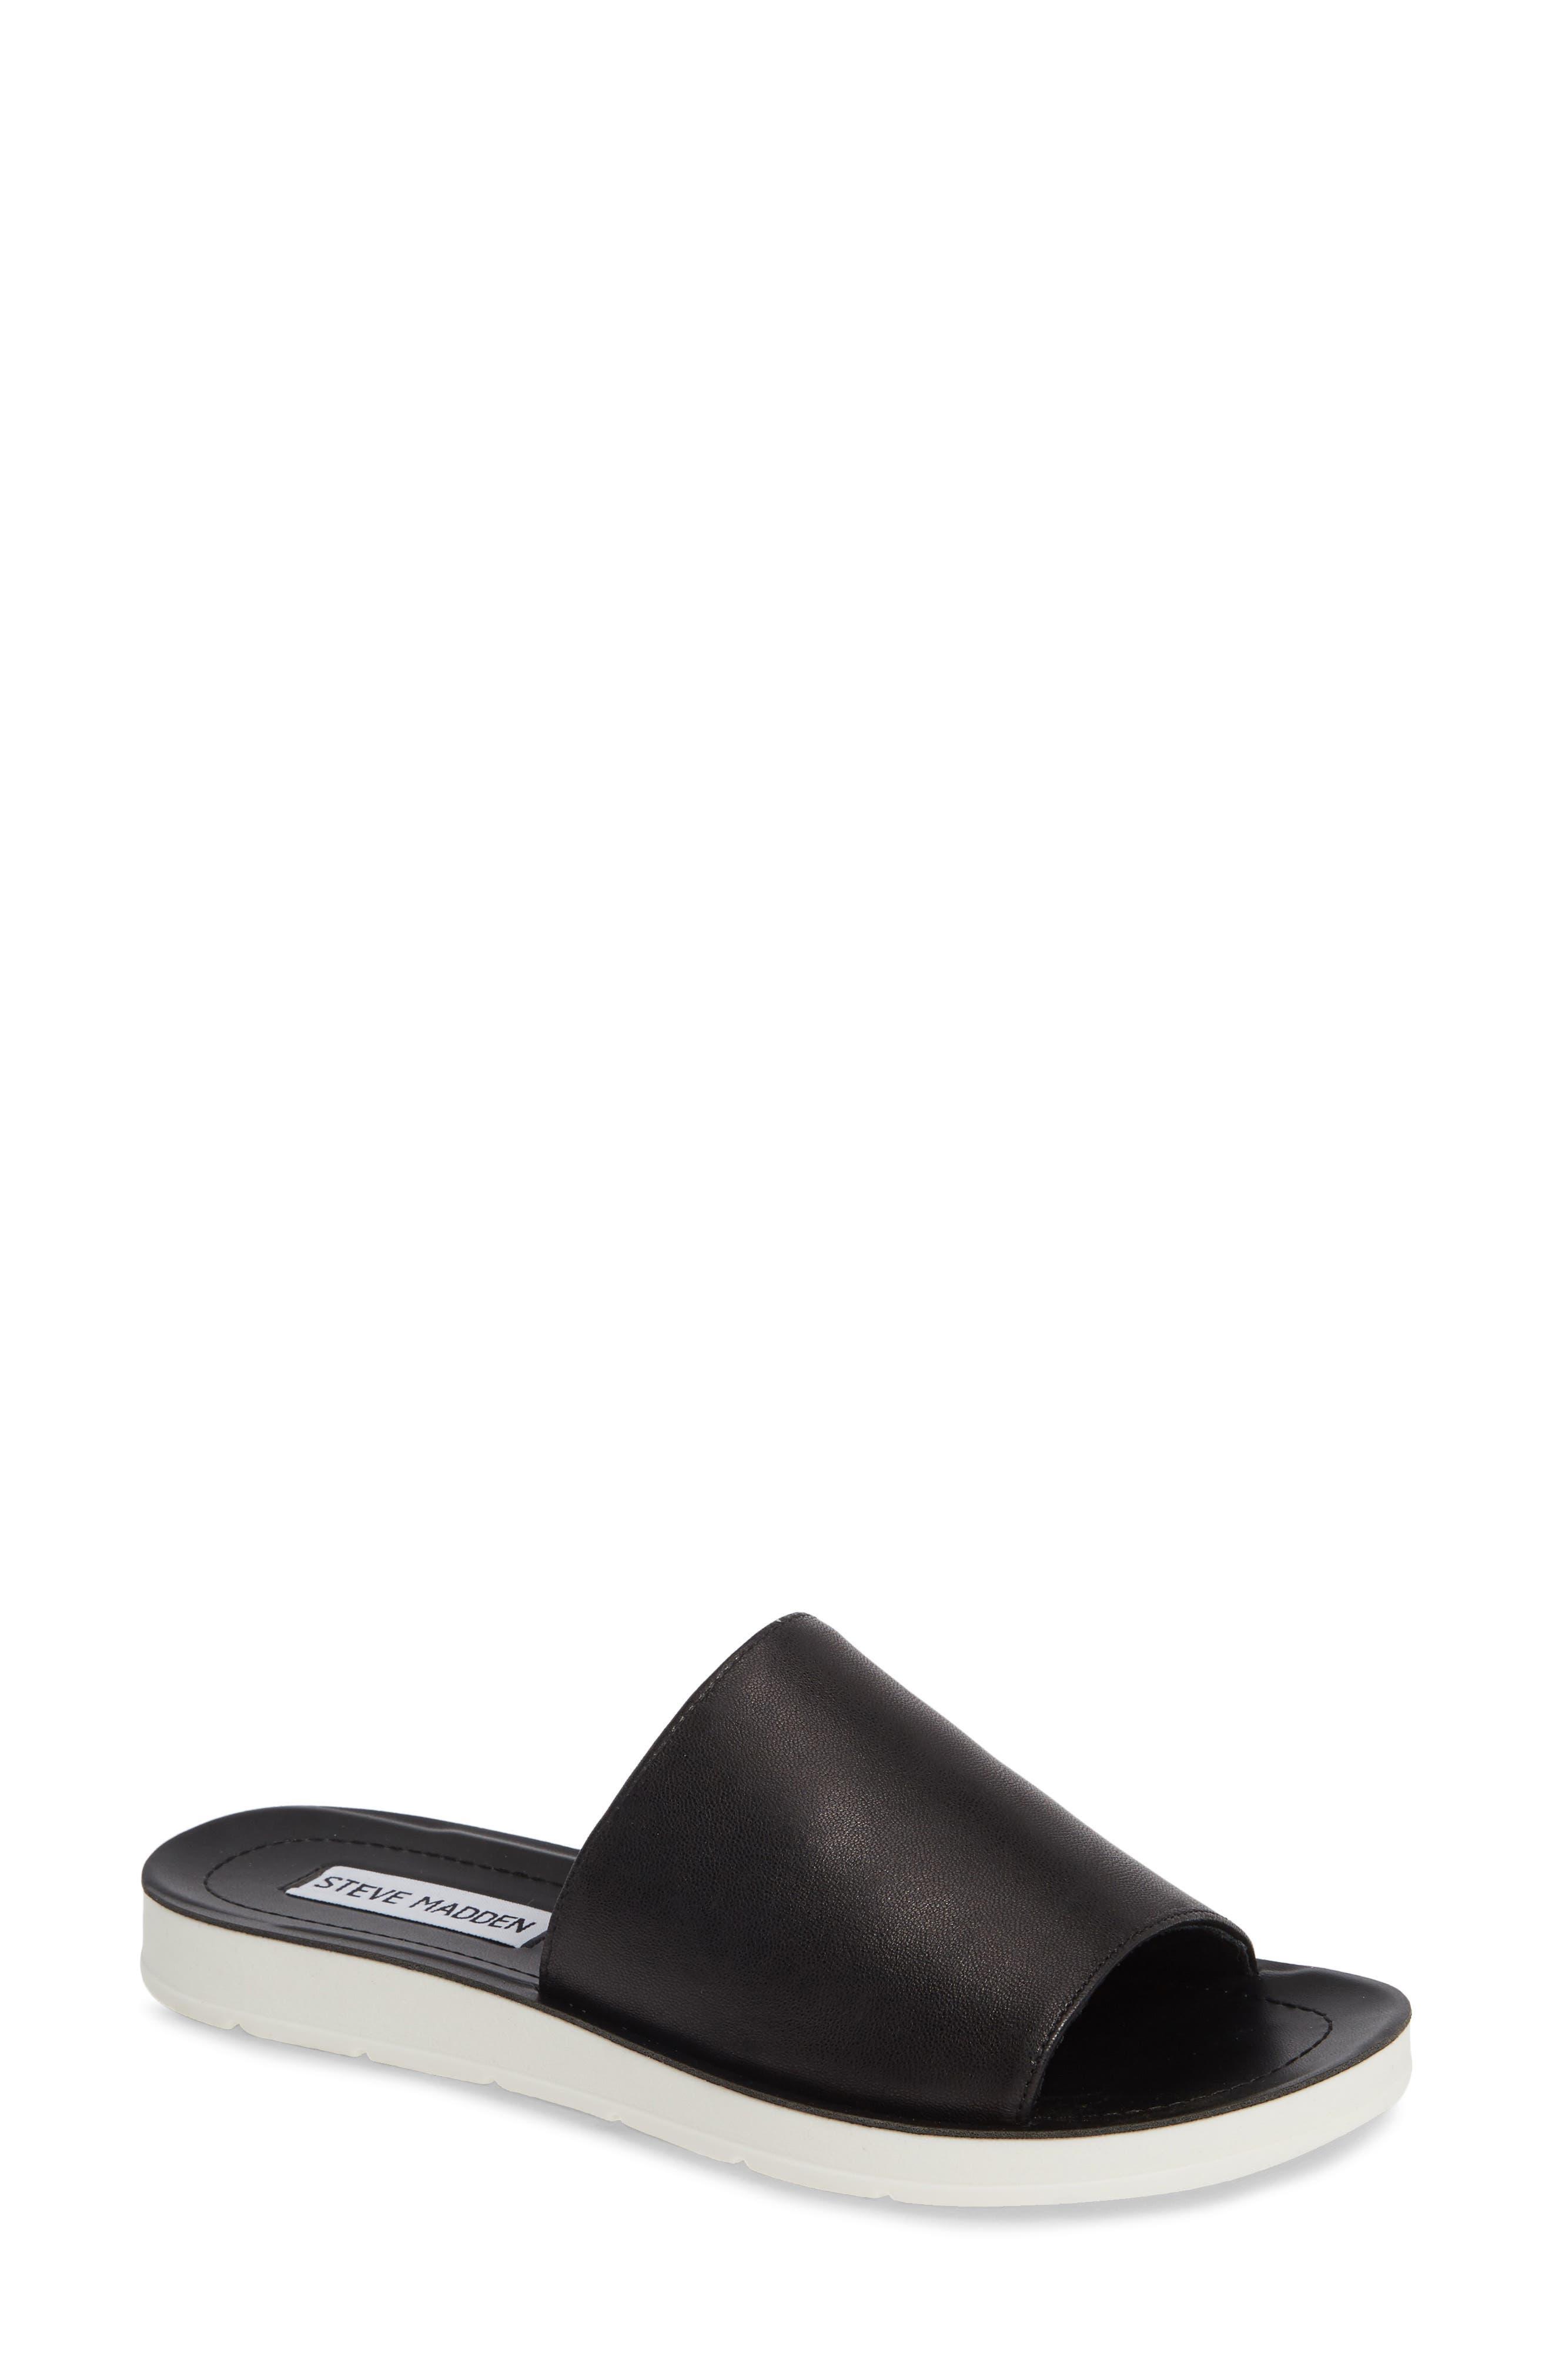 STEVE MADDEN Porter Slide Sandal, Main, color, BLACK LEATHER